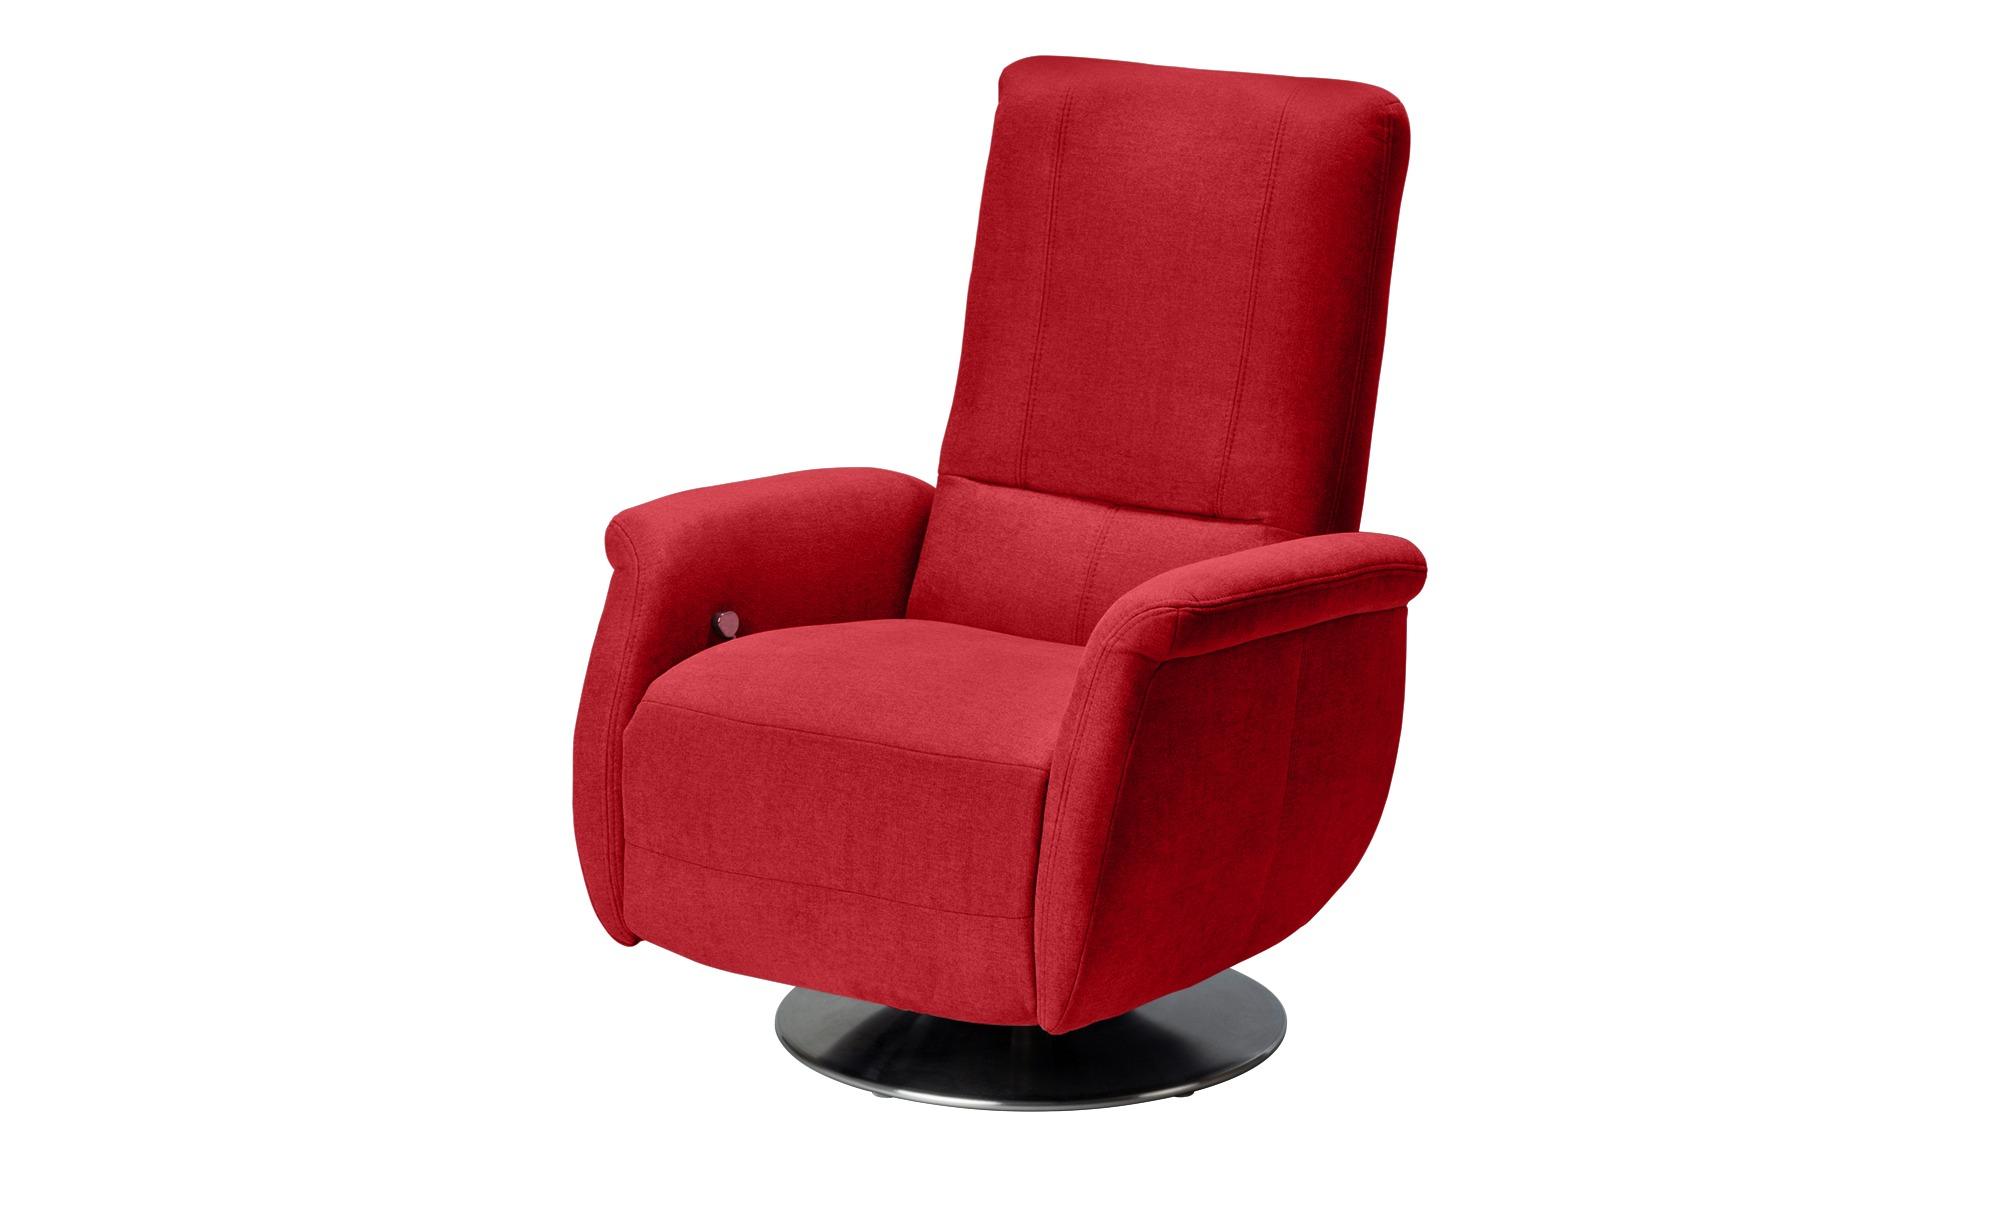 meinSofa Relaxsessel rot - Stoff Felix ¦ rot Polstermöbel > Sessel > Fernsehsessel - Höffner